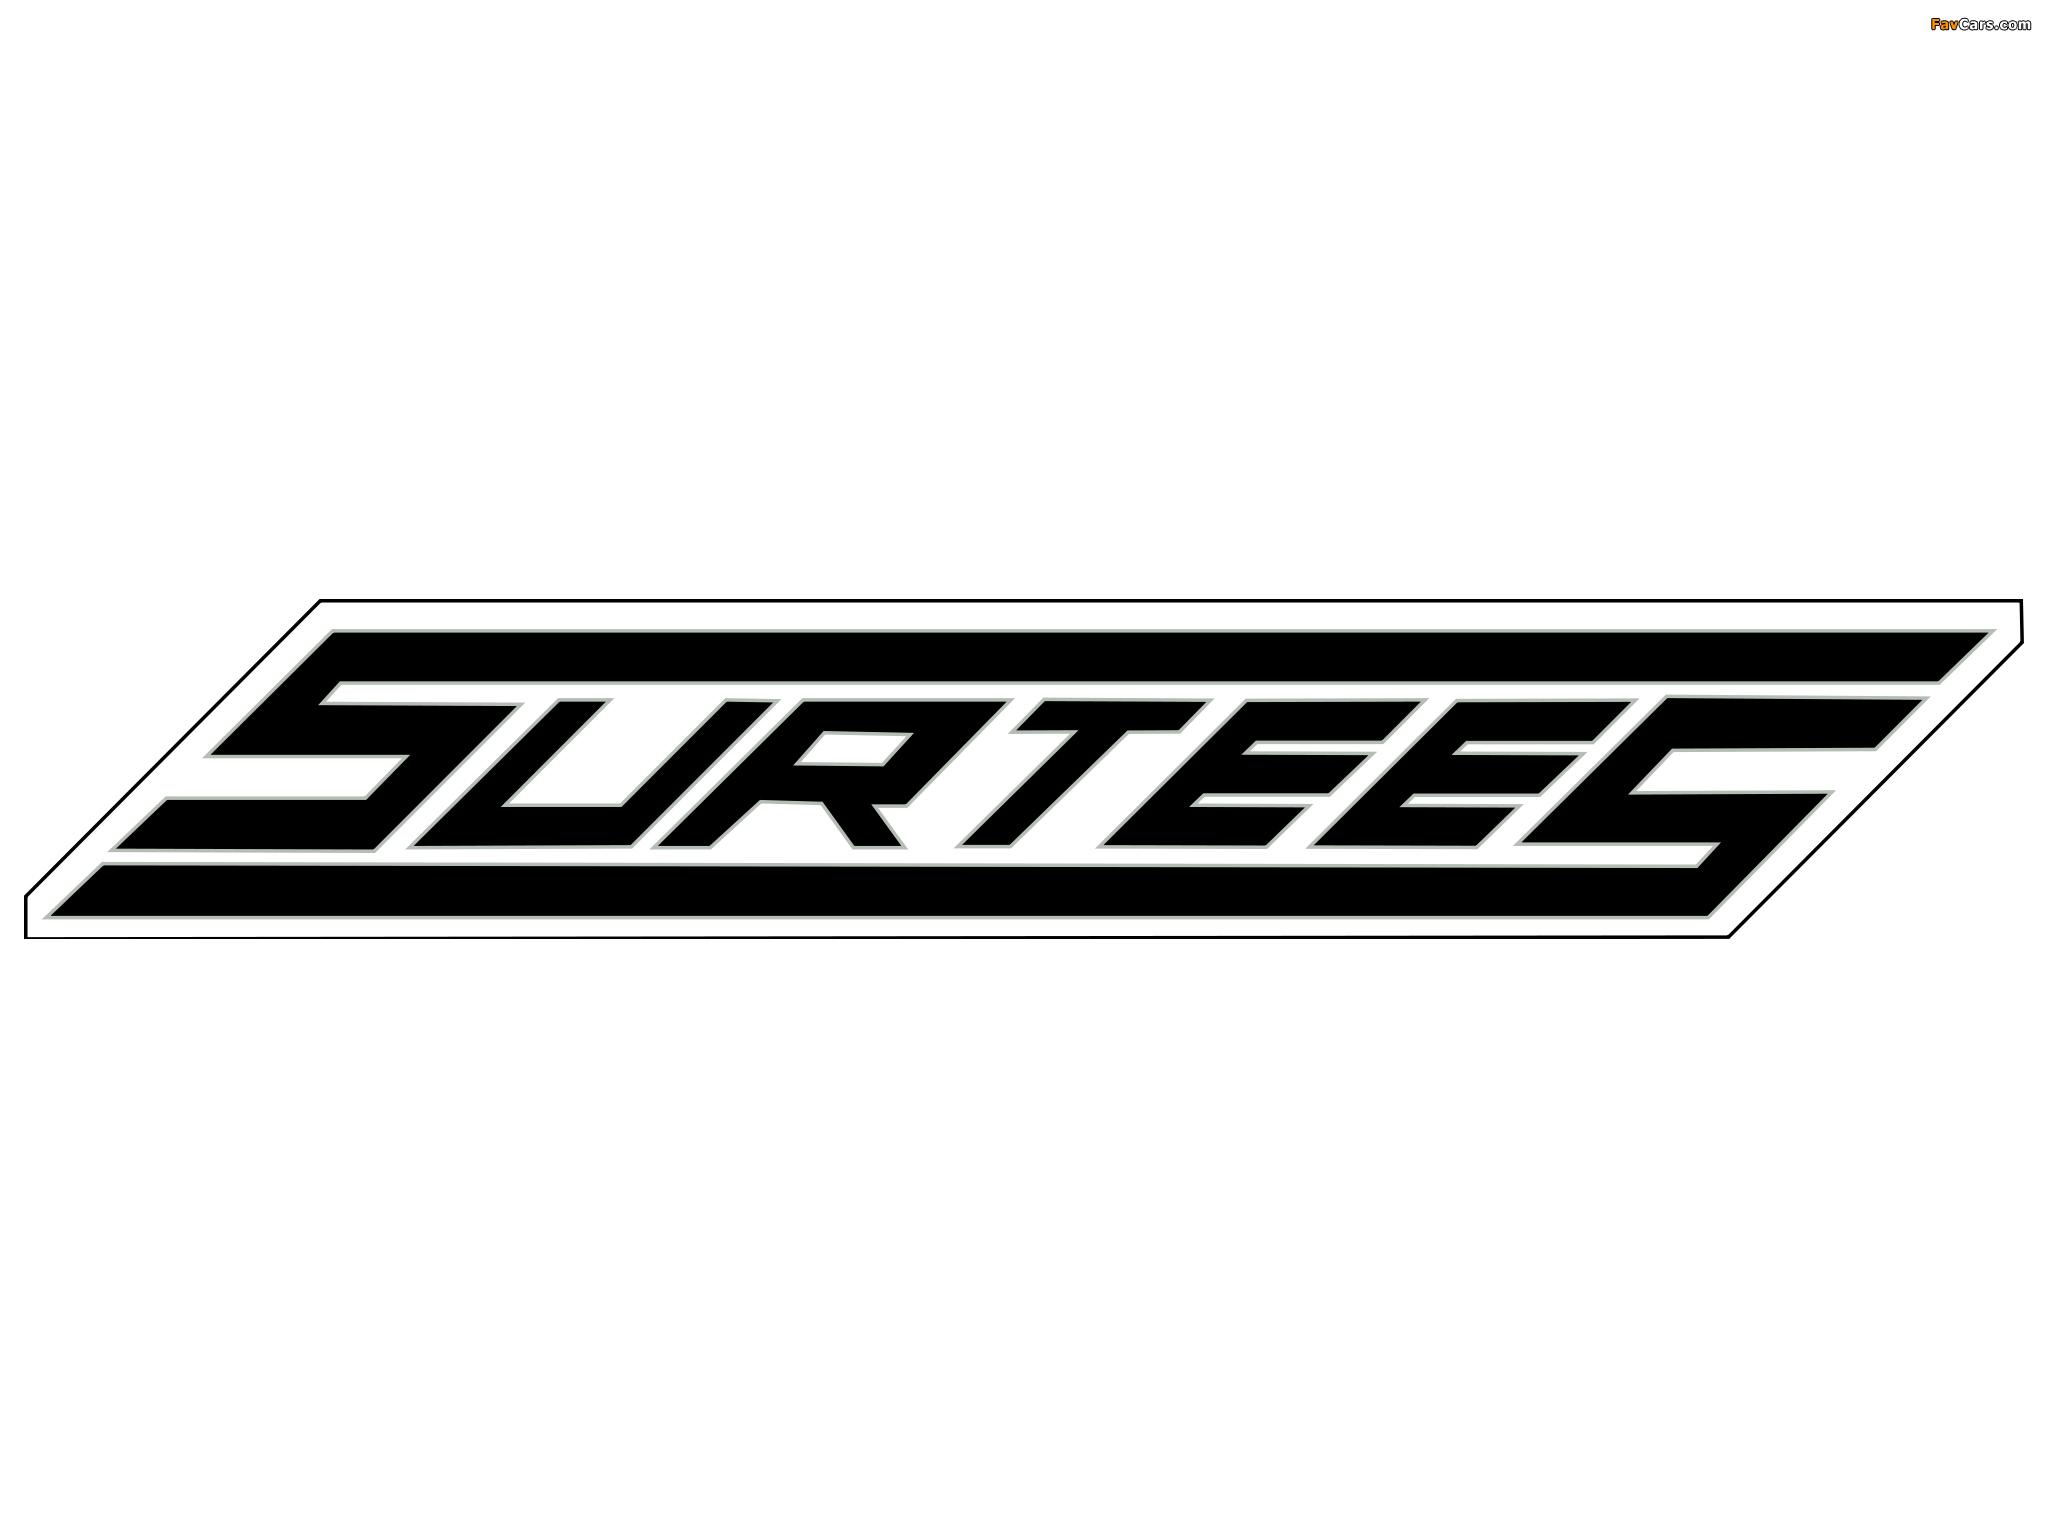 Surtees photos (2048 x 1536)